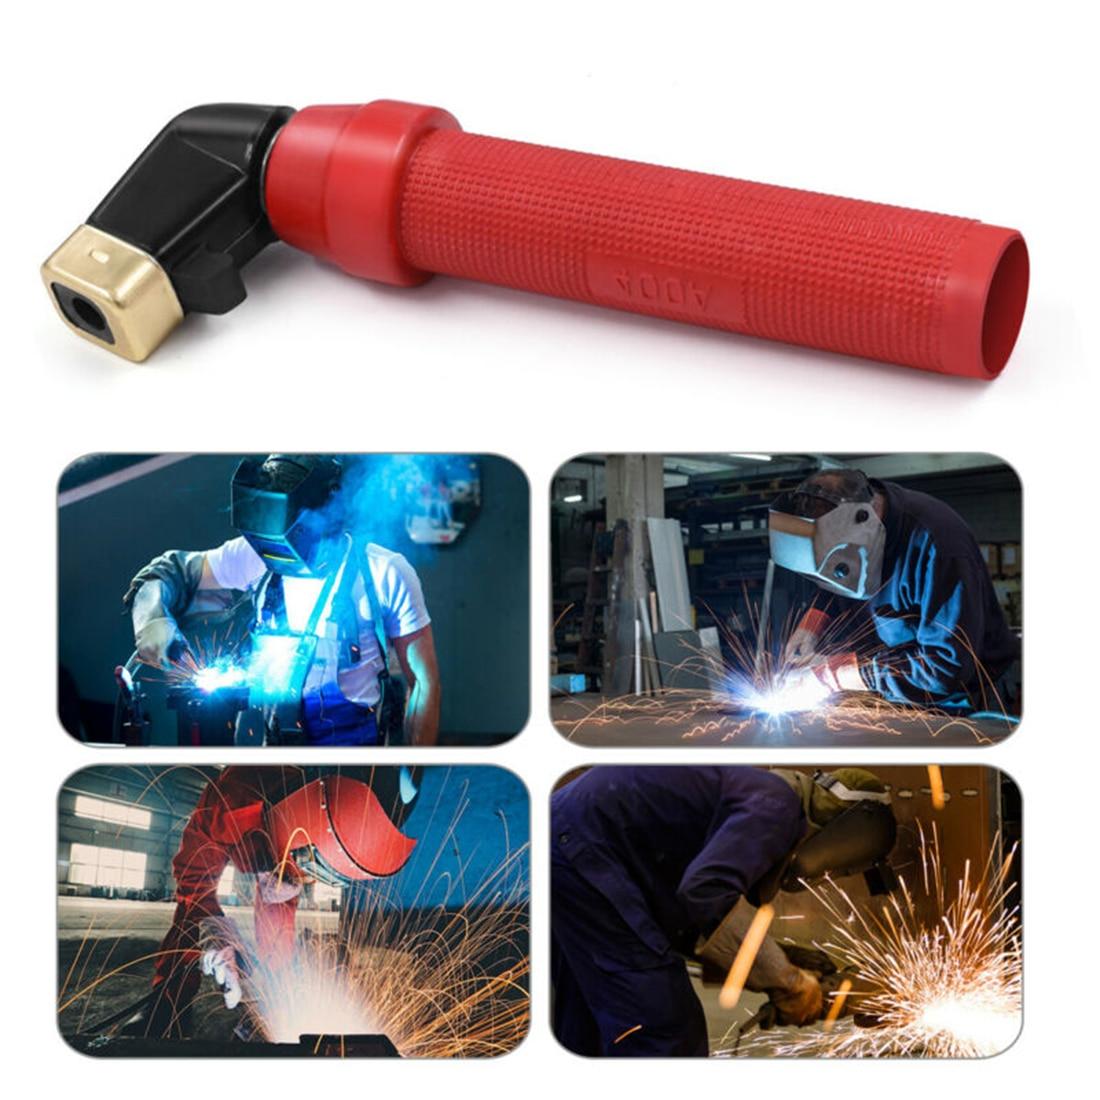 HITBOX 300A 400A Electrode Weld Holder MMA Welding Accessories ARC Welding Holders Tool Red 380V ARC Welding Holder